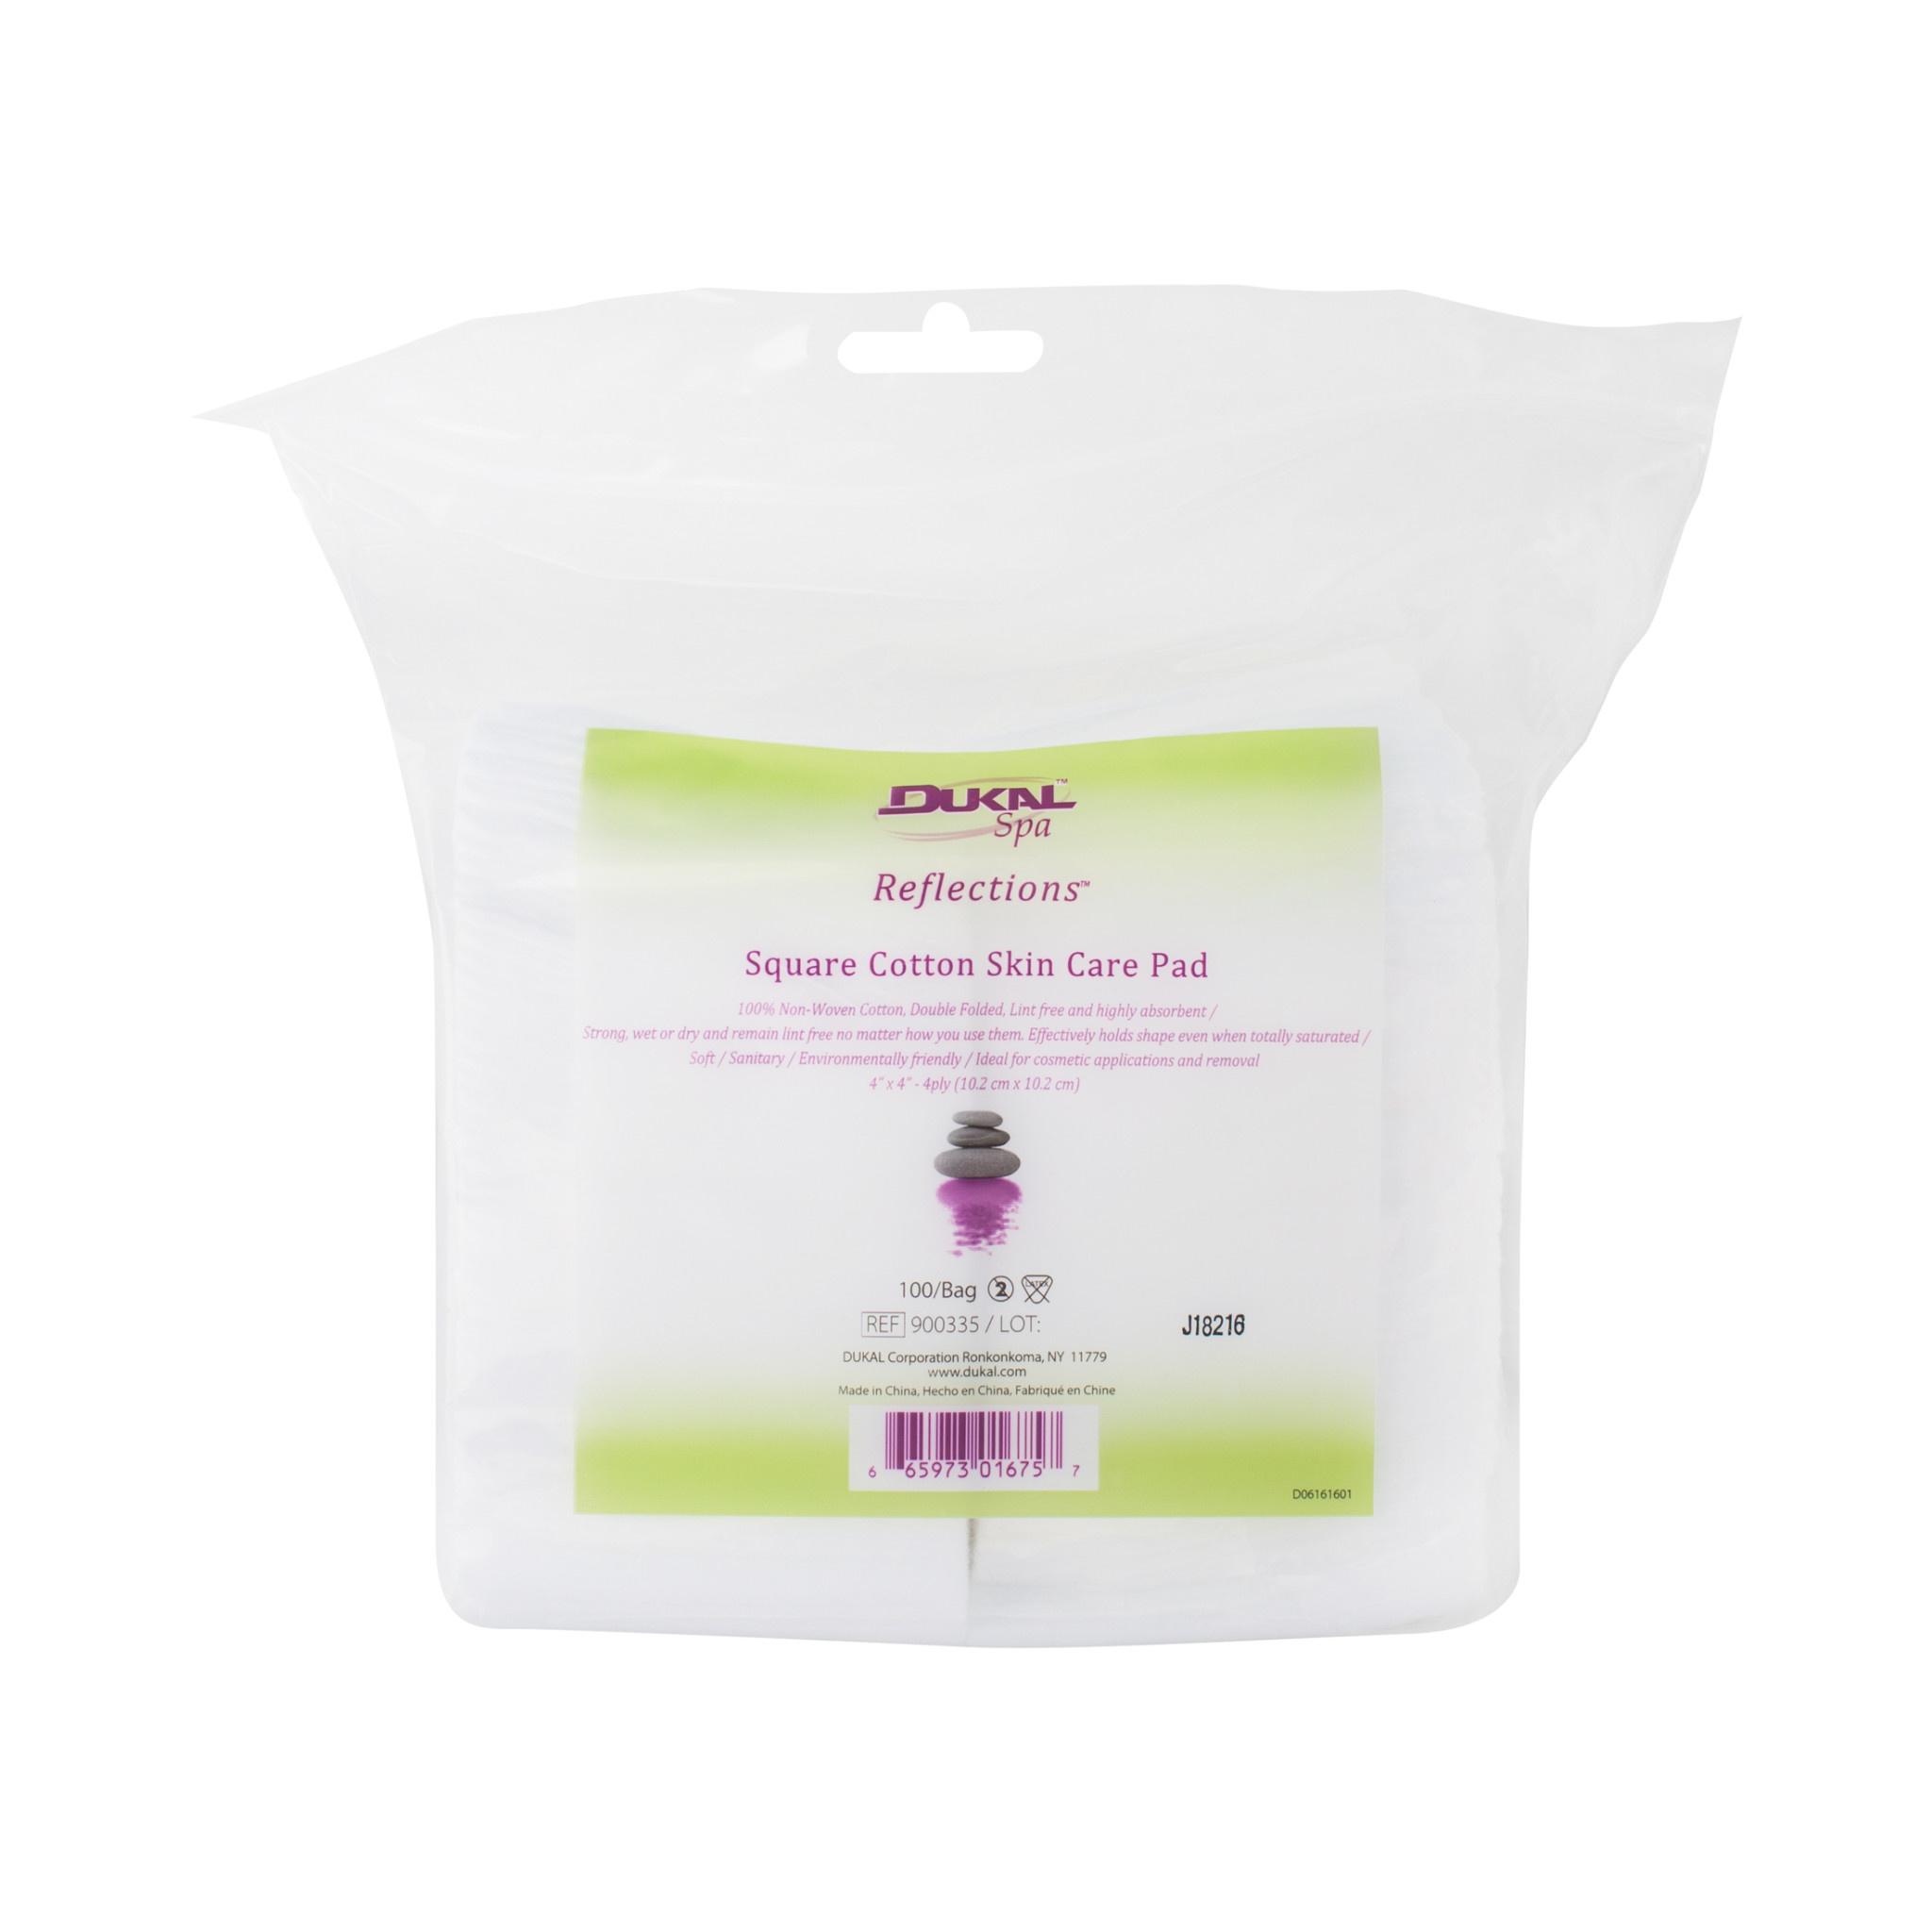 Square Cotton Skin Care Pad (100/Bag)